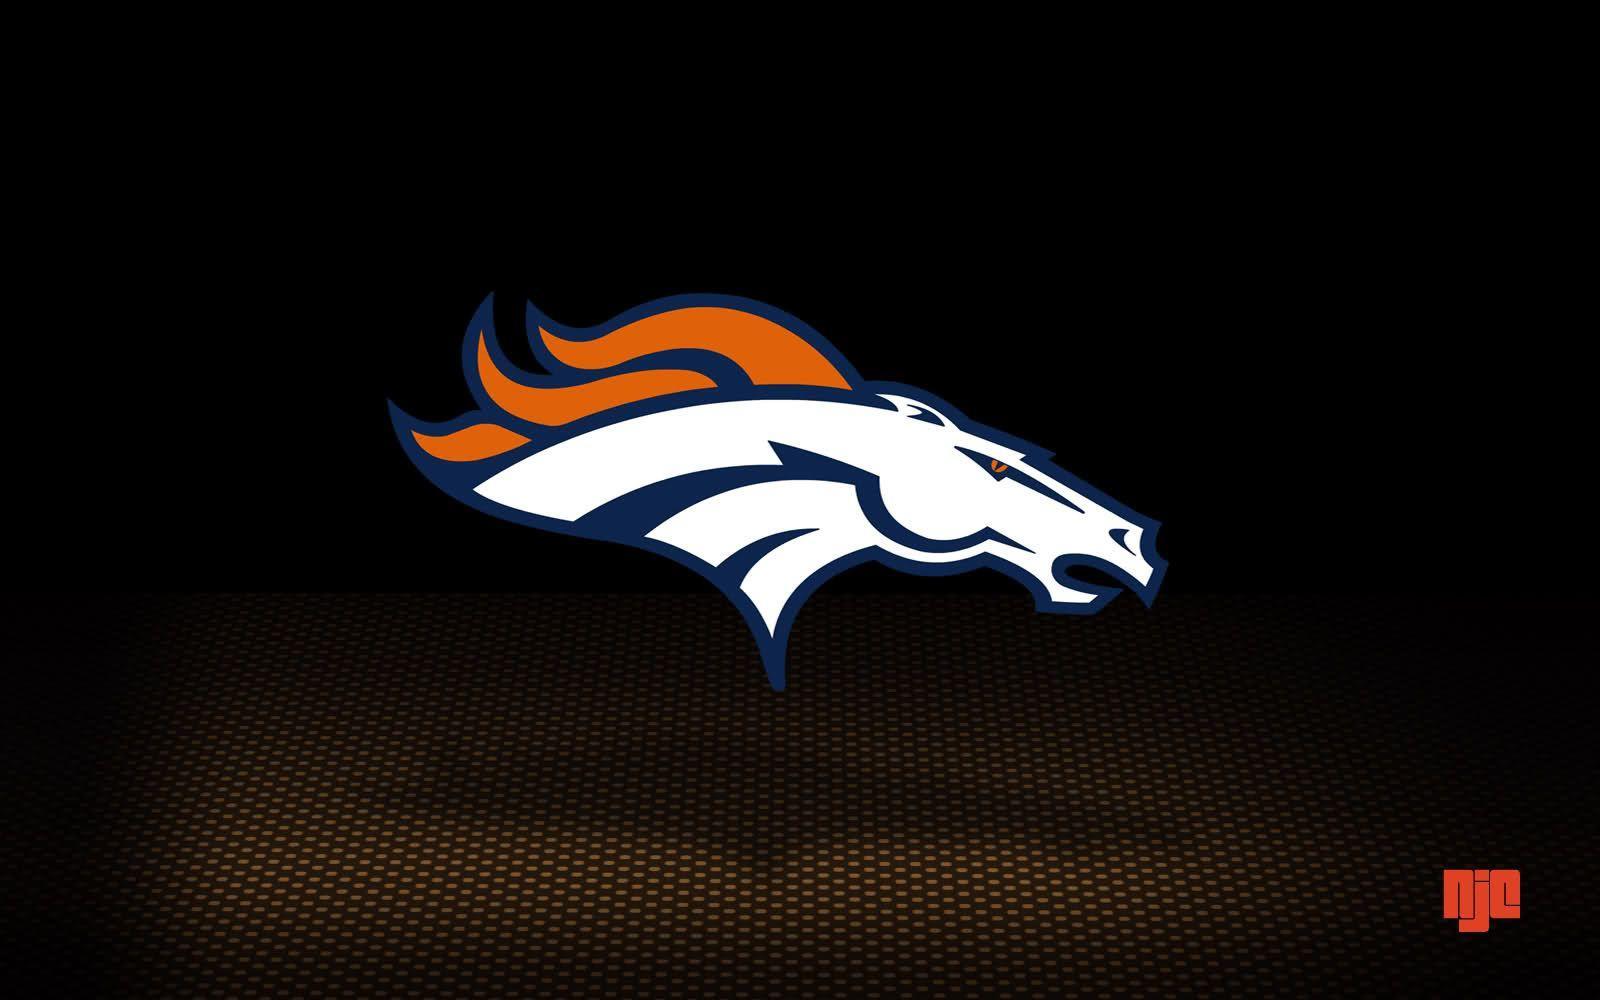 Denver Broncos Desktop Wallpapers - Wallpaper Cave